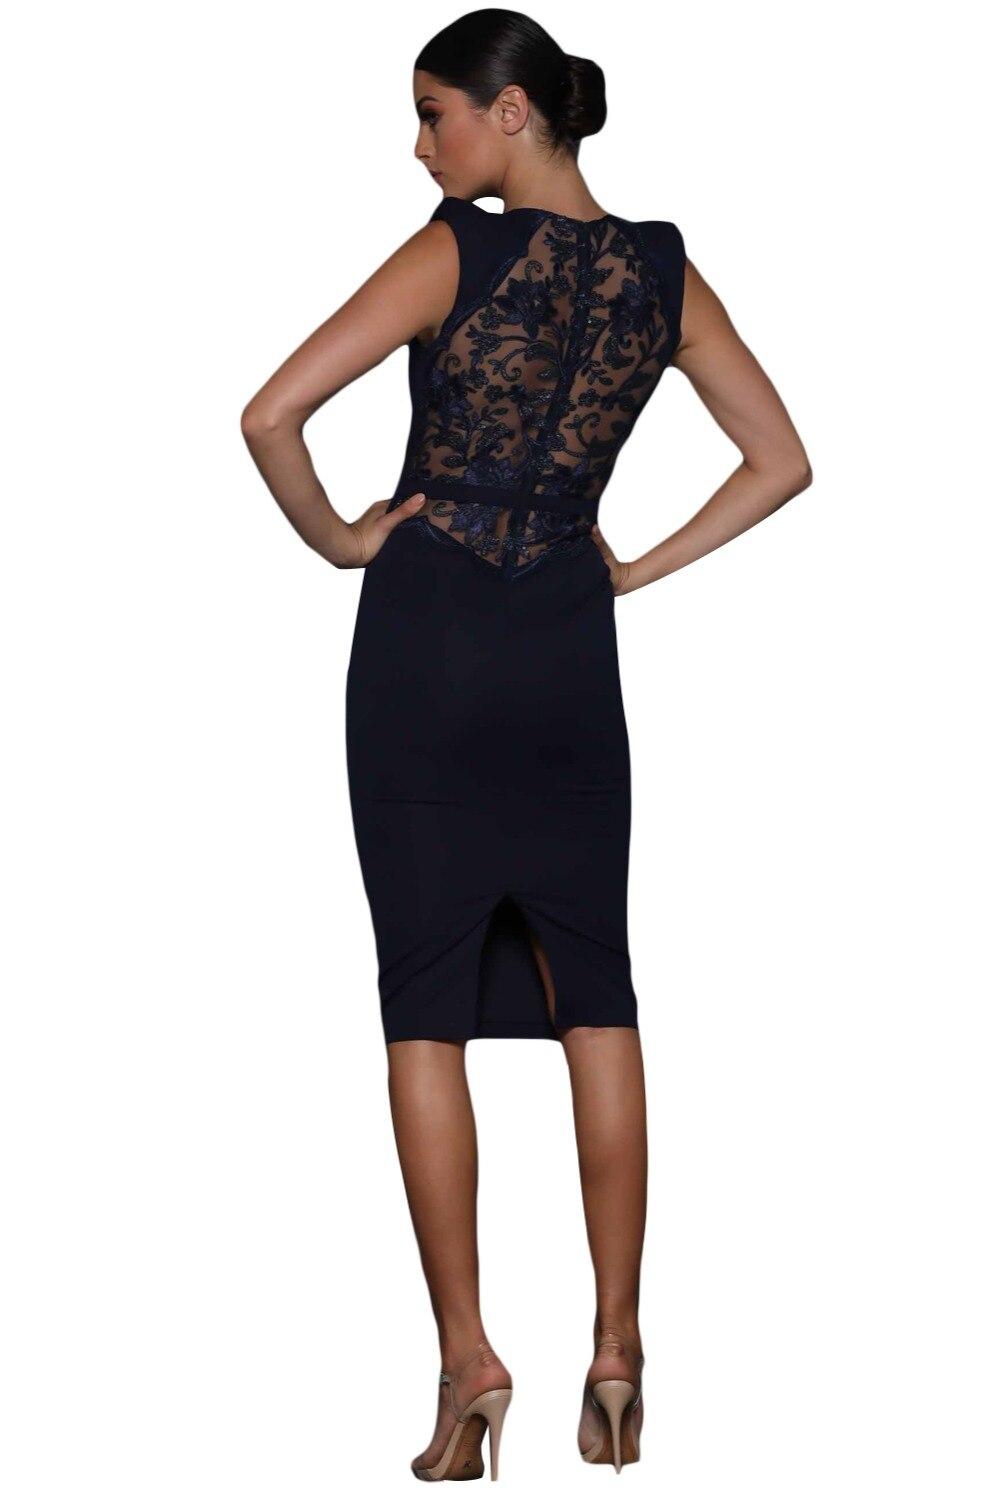 Dear Lover Women Summer Dresses Office Ladies Elegant Navy Sheer Lace Back  Sleeveless Midi Party Dress Vestidos Verano LC610299 aea989310131